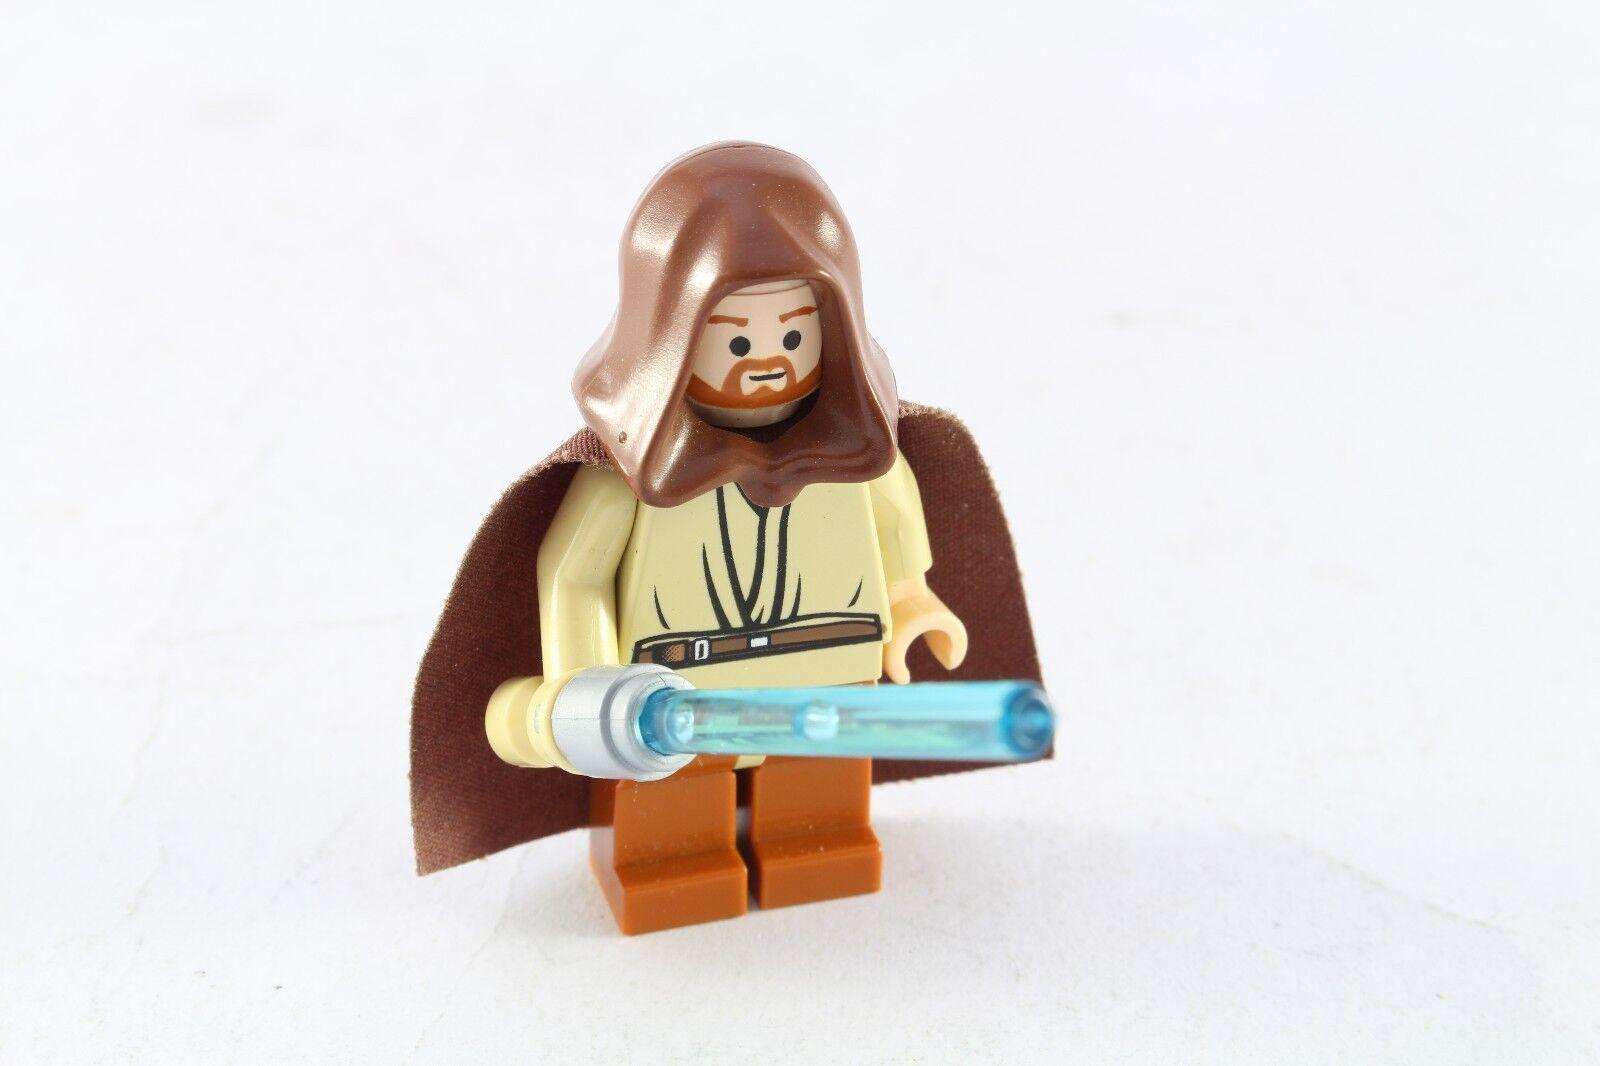 Lego Star Wars Wars Wars Obi Wan Kenobi Original Minifigure Light Up Lightsaber Working 631a33